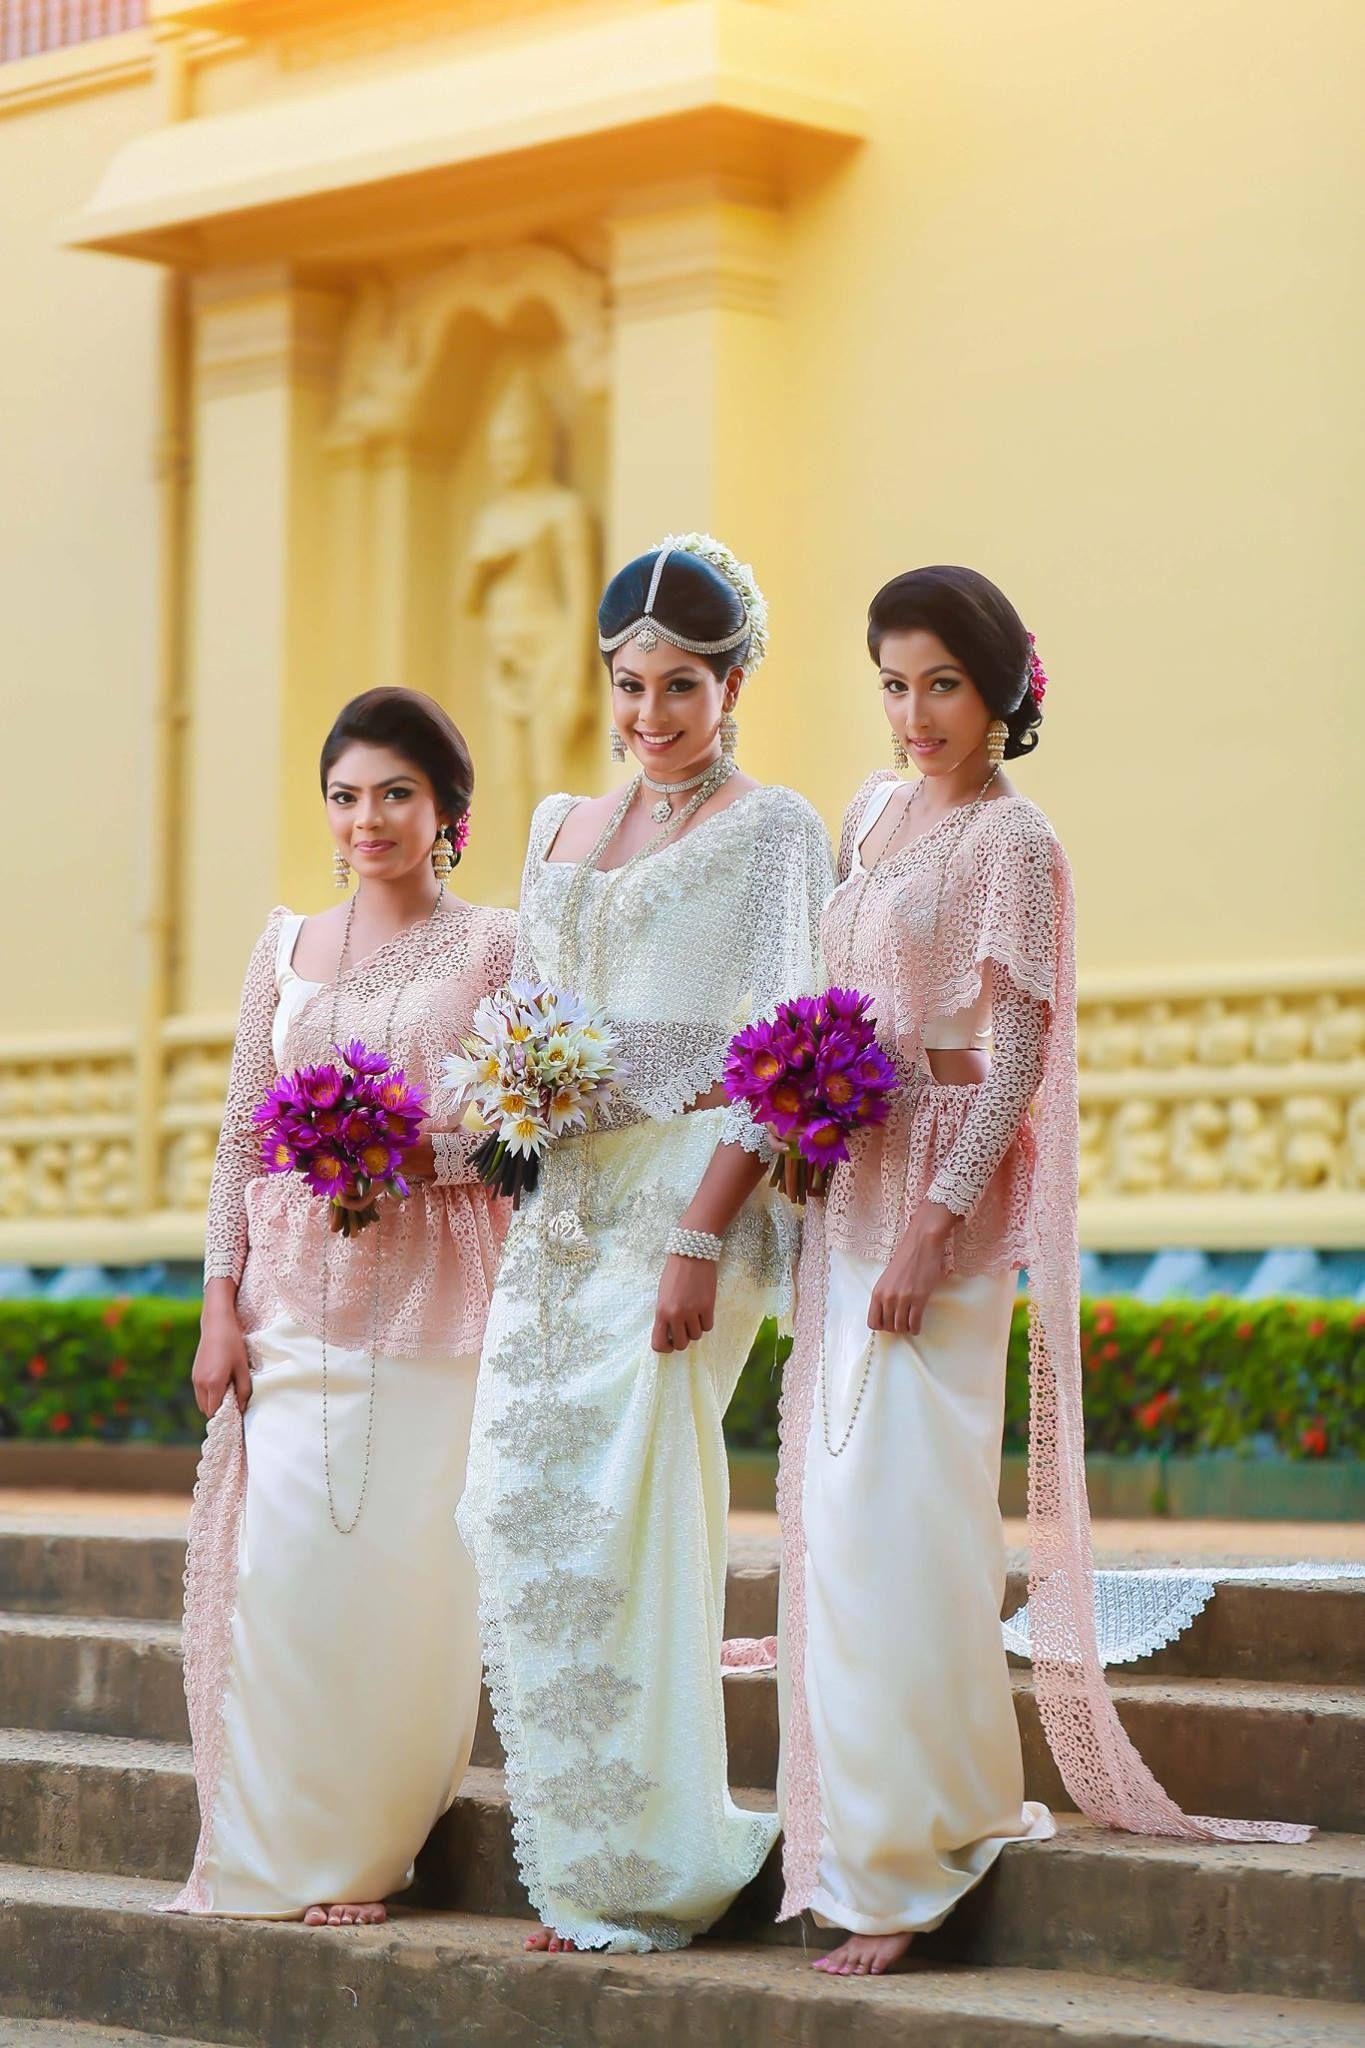 Dress by subash bridal sri lanka sri lankan weddings for Wedding party dresses in sri lanka